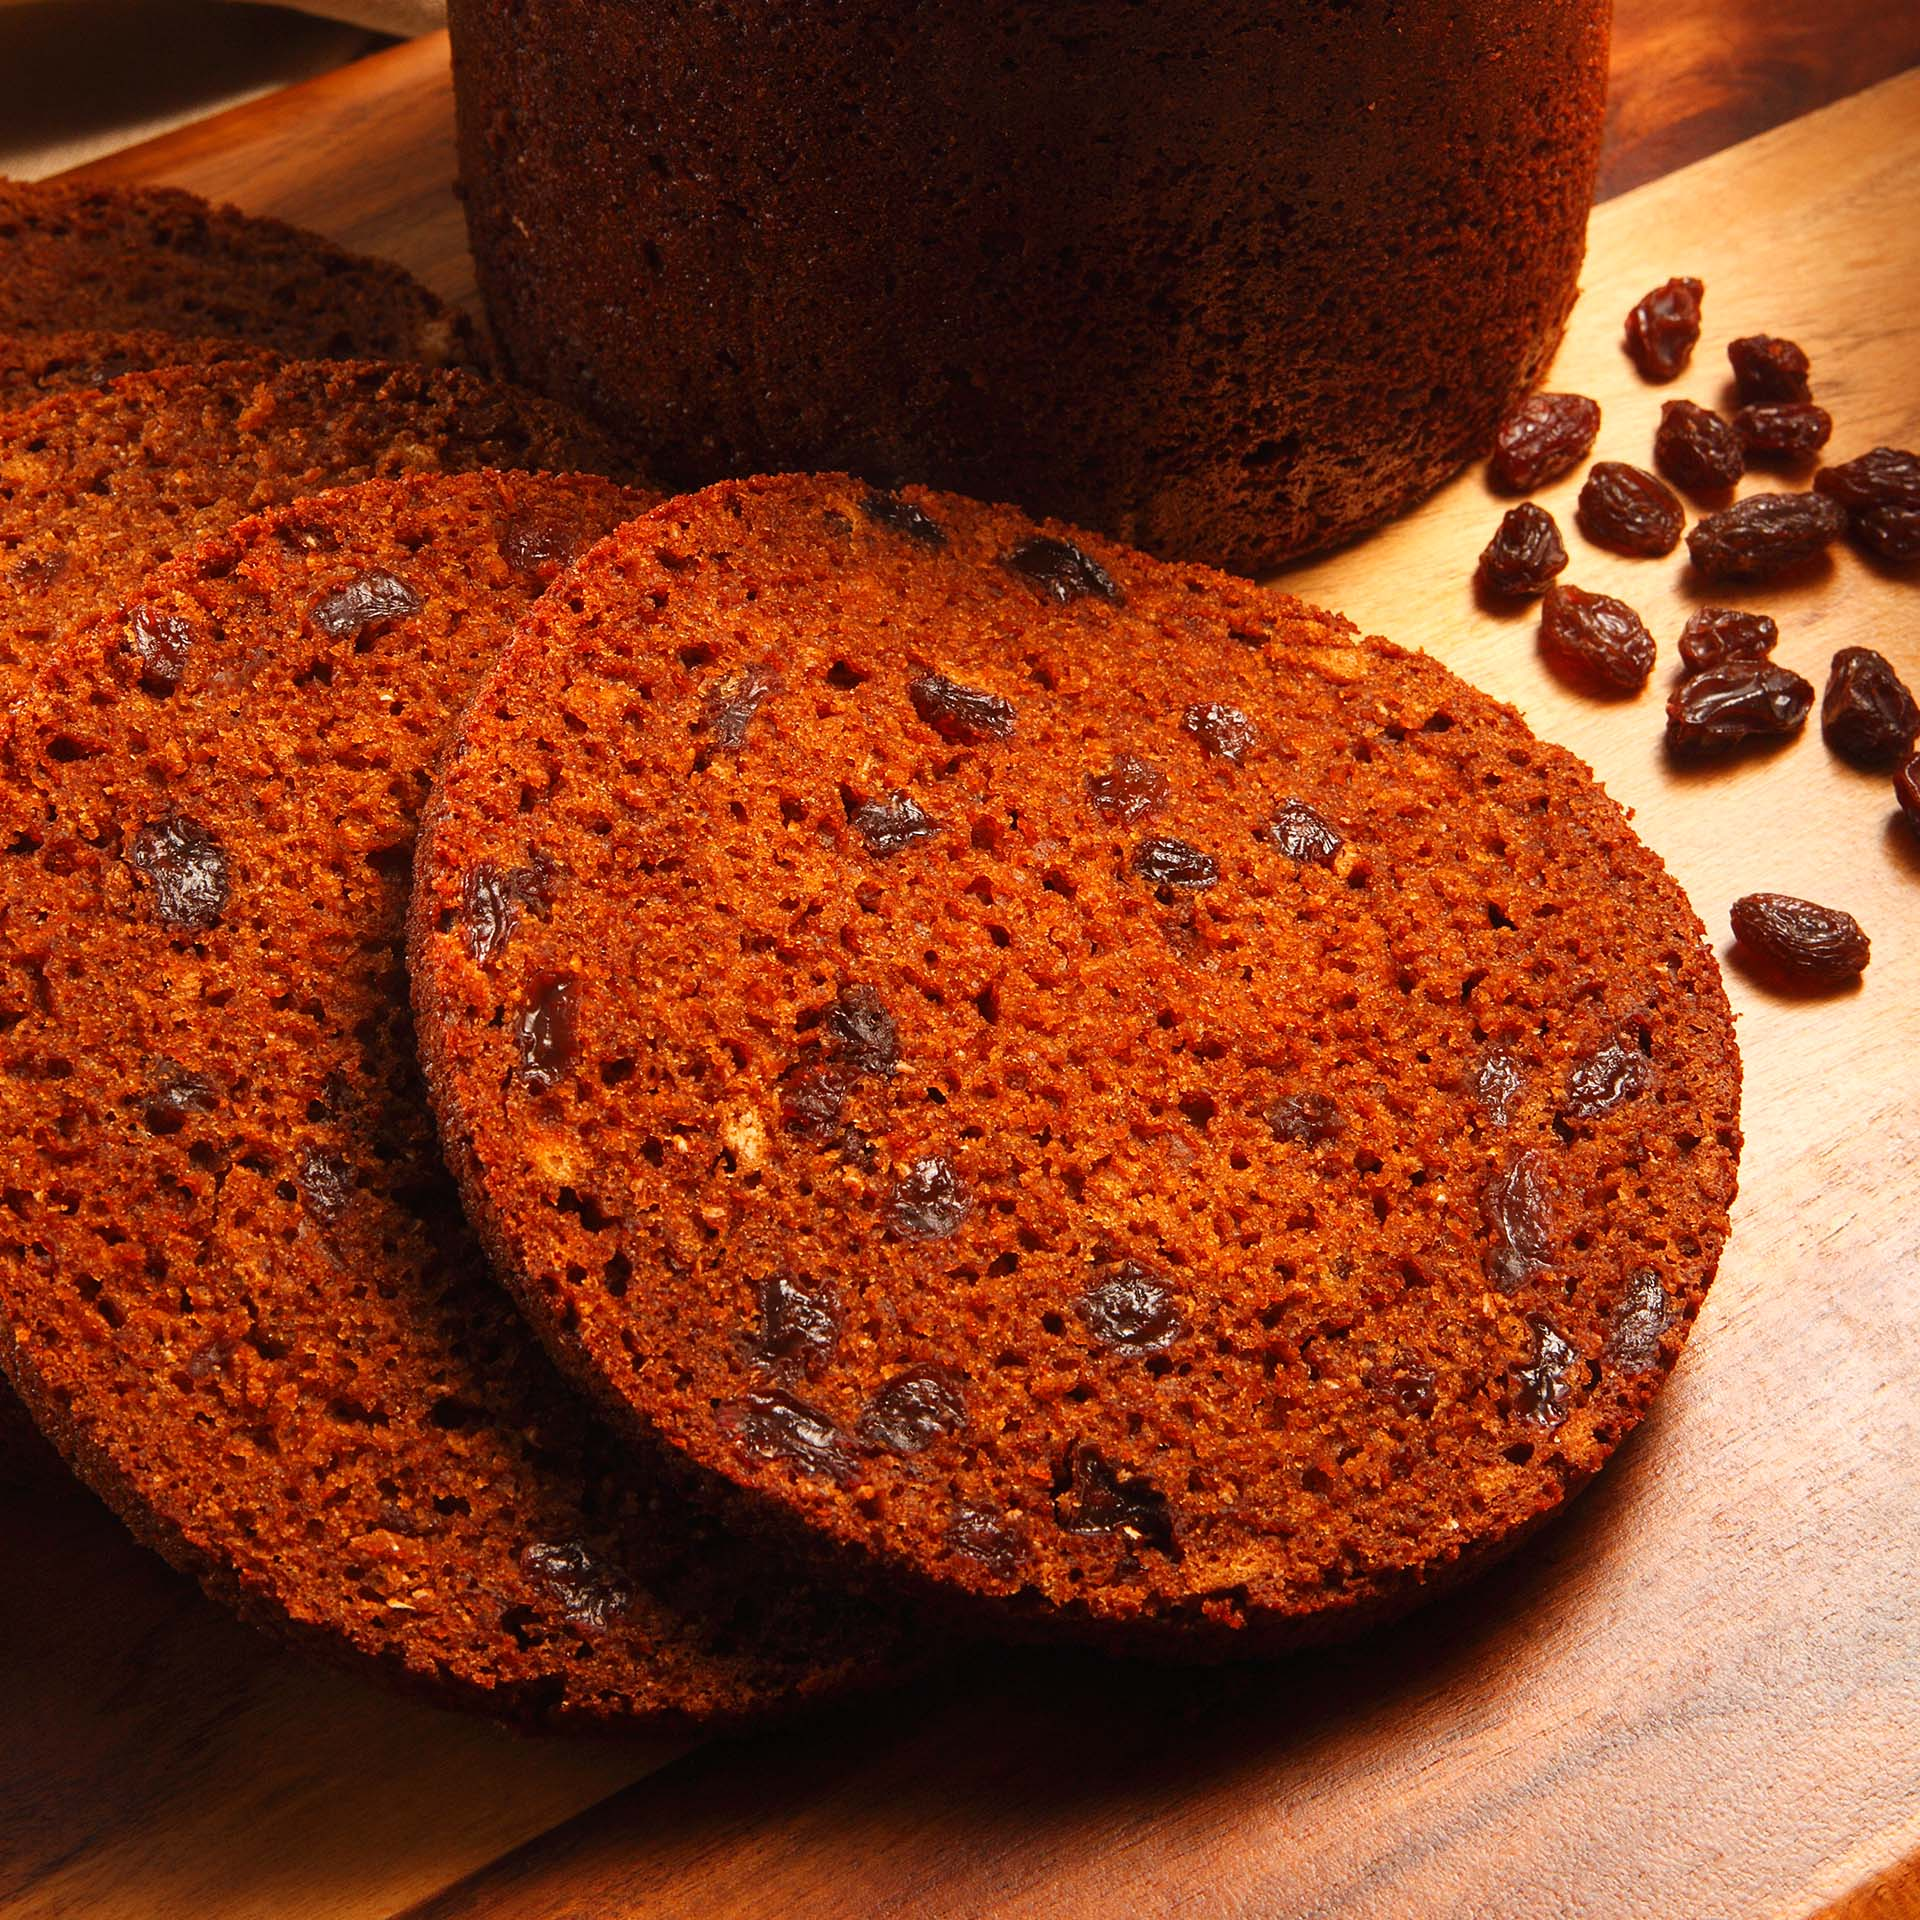 Baked Brown Raisin Bread California Raisins